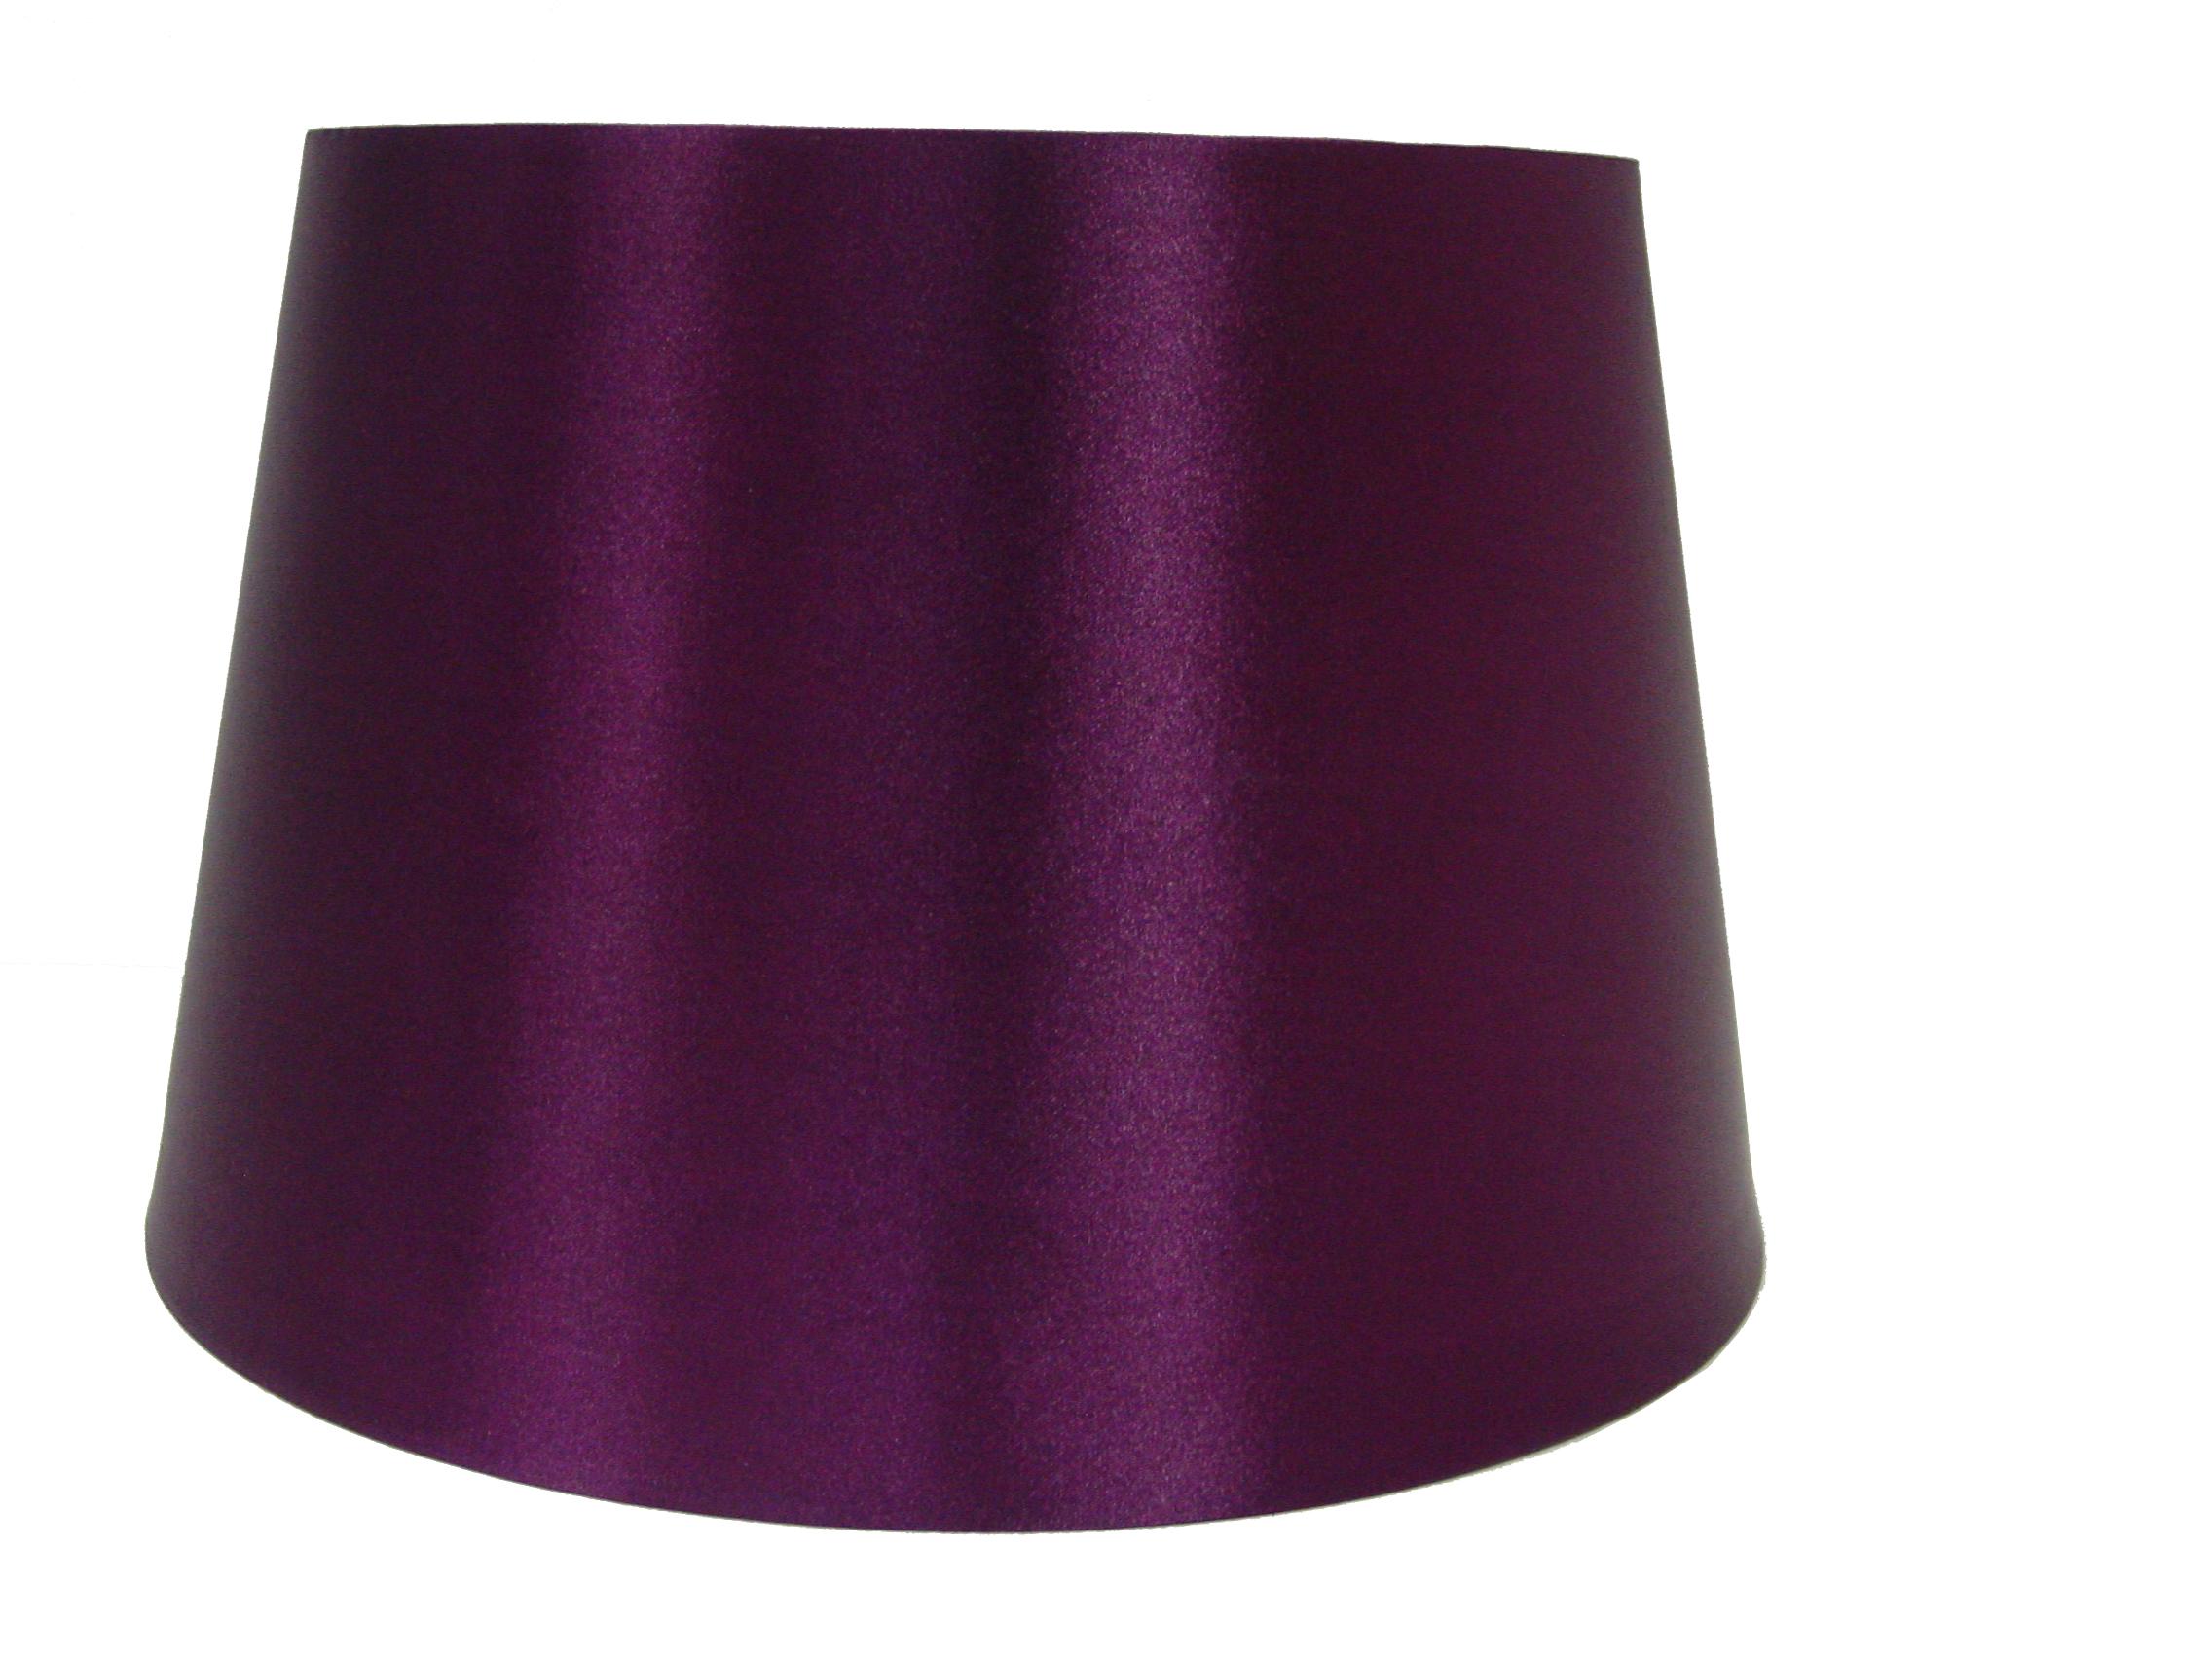 14 Quot Satin Drum Ceiling Table Lamp Shade Lampshade Plum